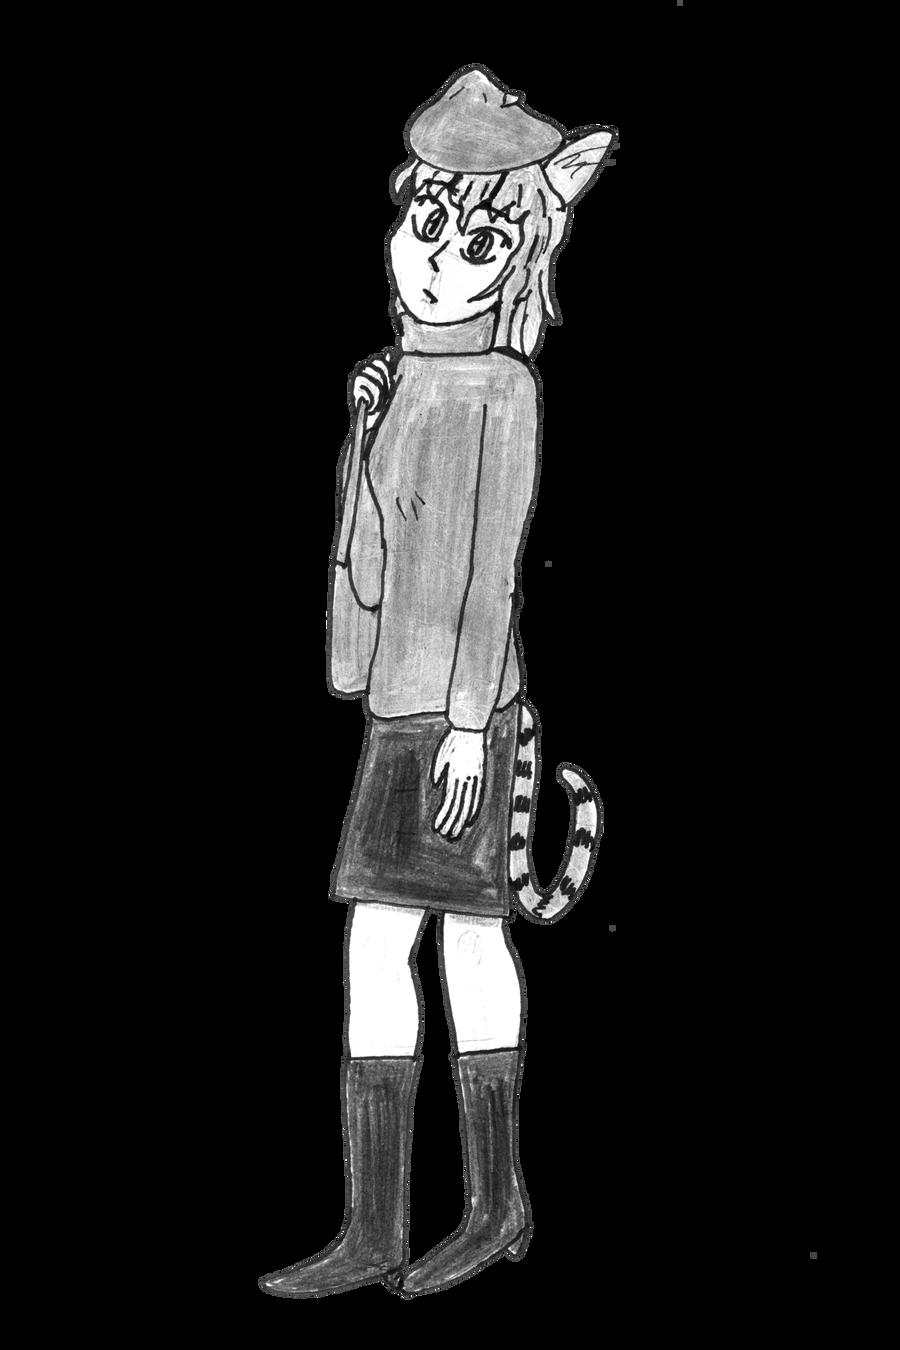 Beret Cat Girl by takeshita-kenji